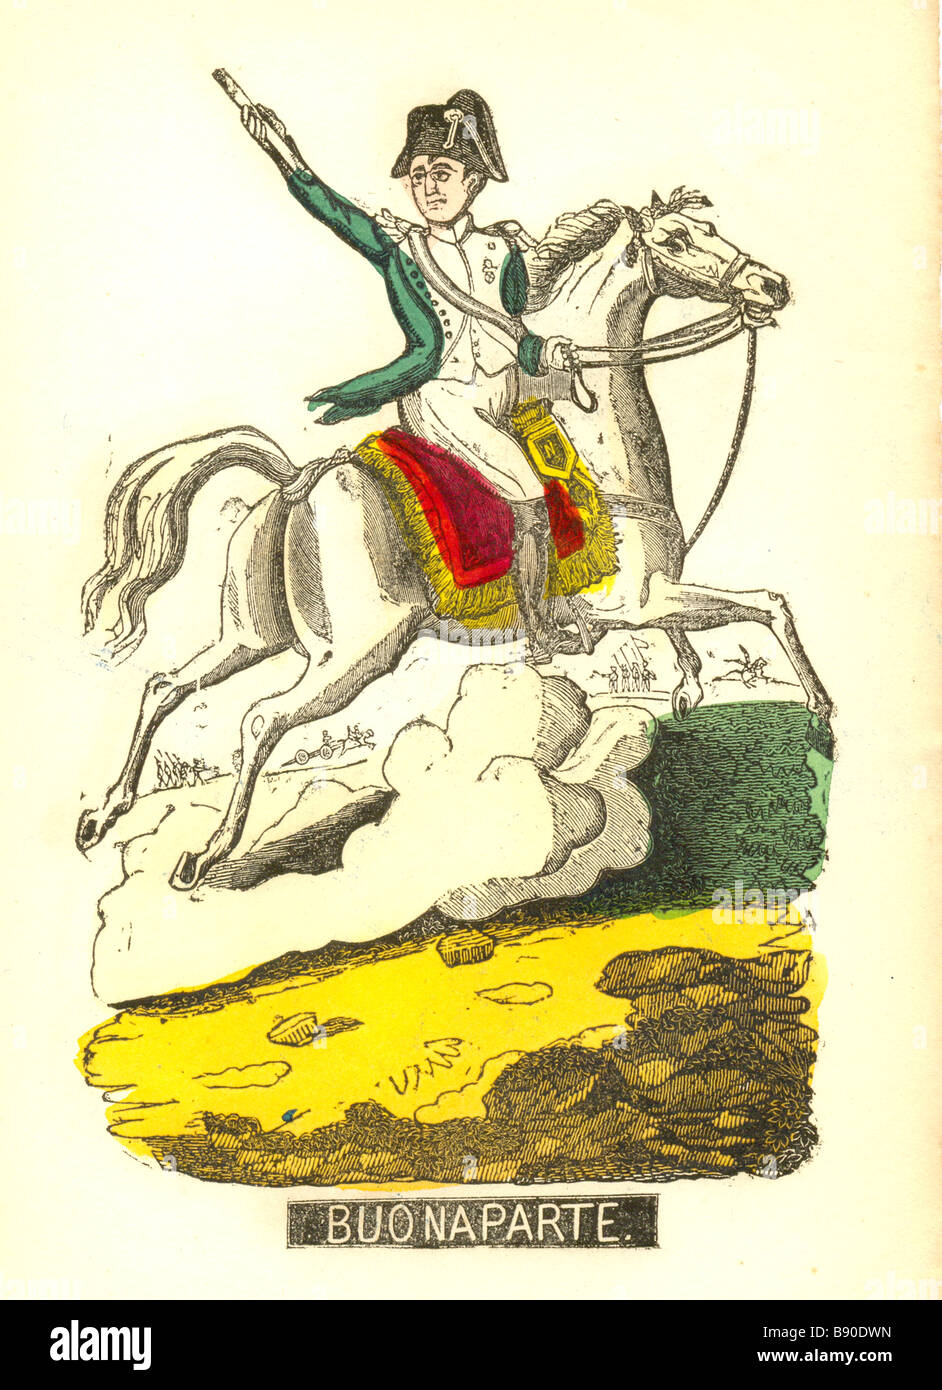 Handkoloriert Holzschnitt von Napoleon Buonaparte um 1820 Stockbild